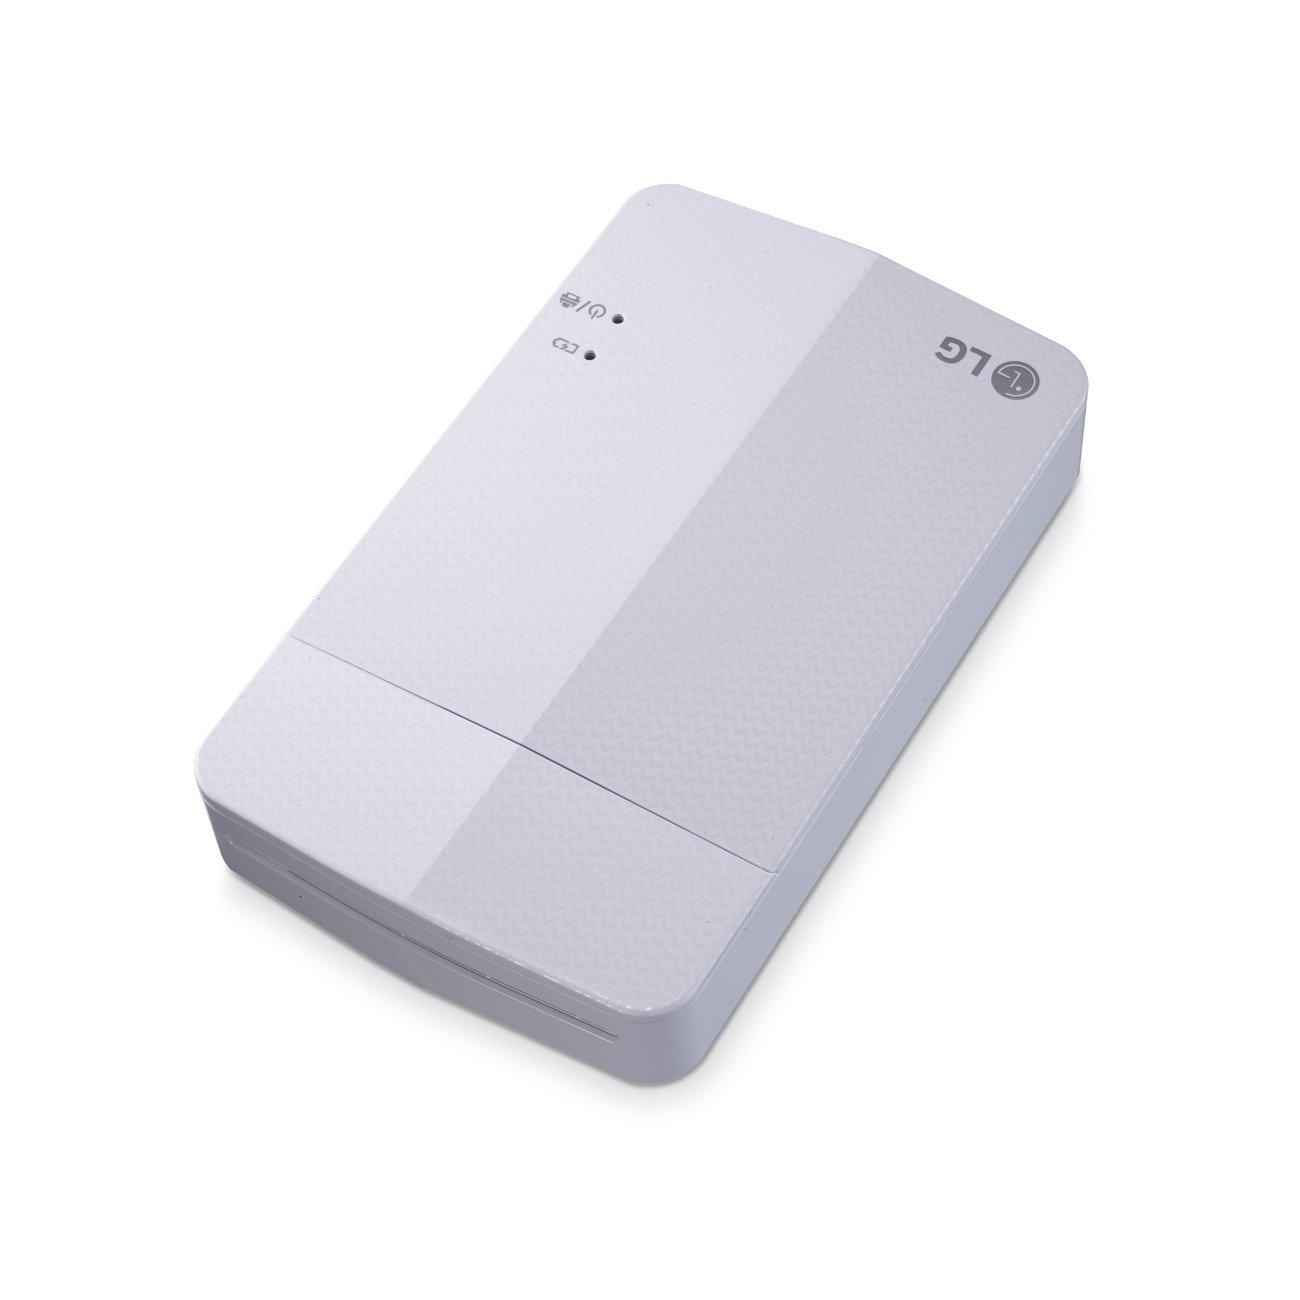 Impresora de fotos de bolsillo LG PD251 3 (modelo de seguimiento ...